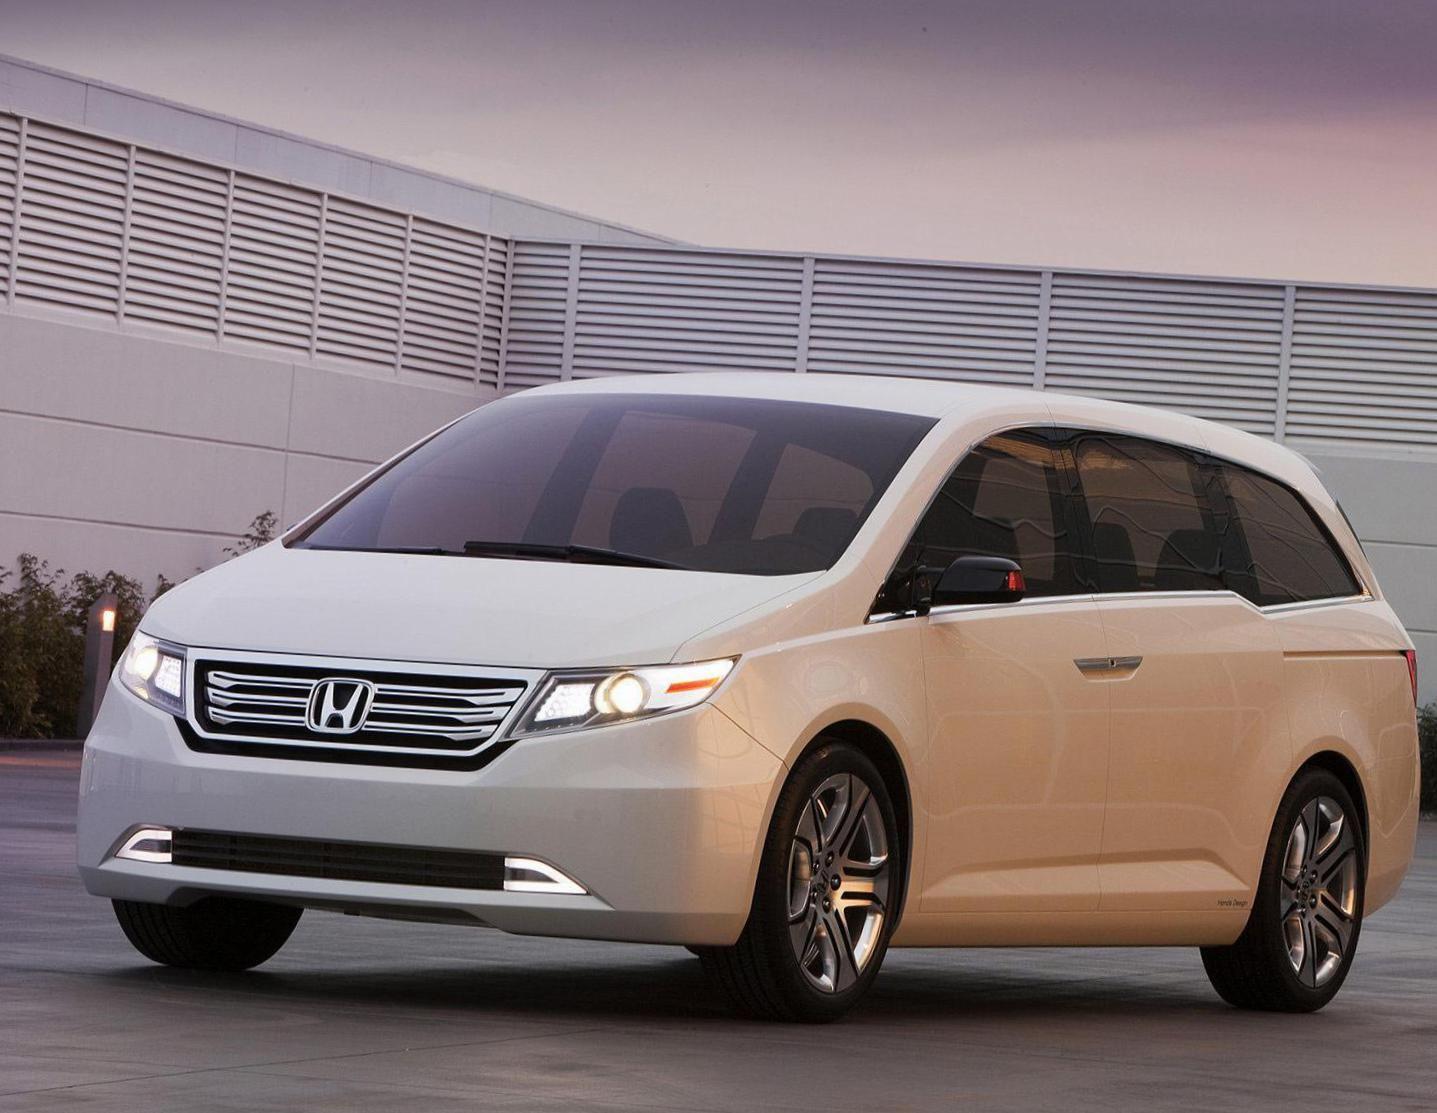 Honda Odyssey Photos and Specs. Photo Odyssey Honda